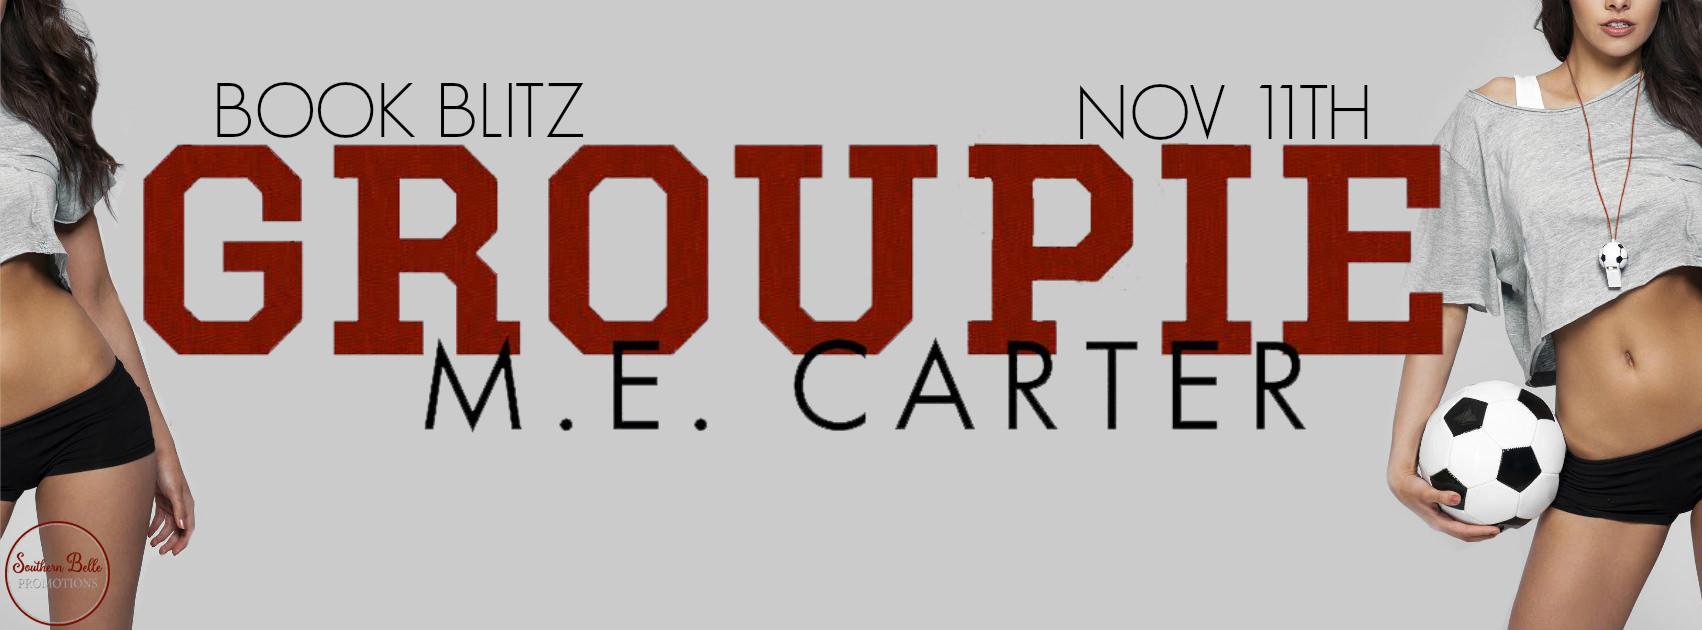 Groupie by M.E. Carter Book Blitz